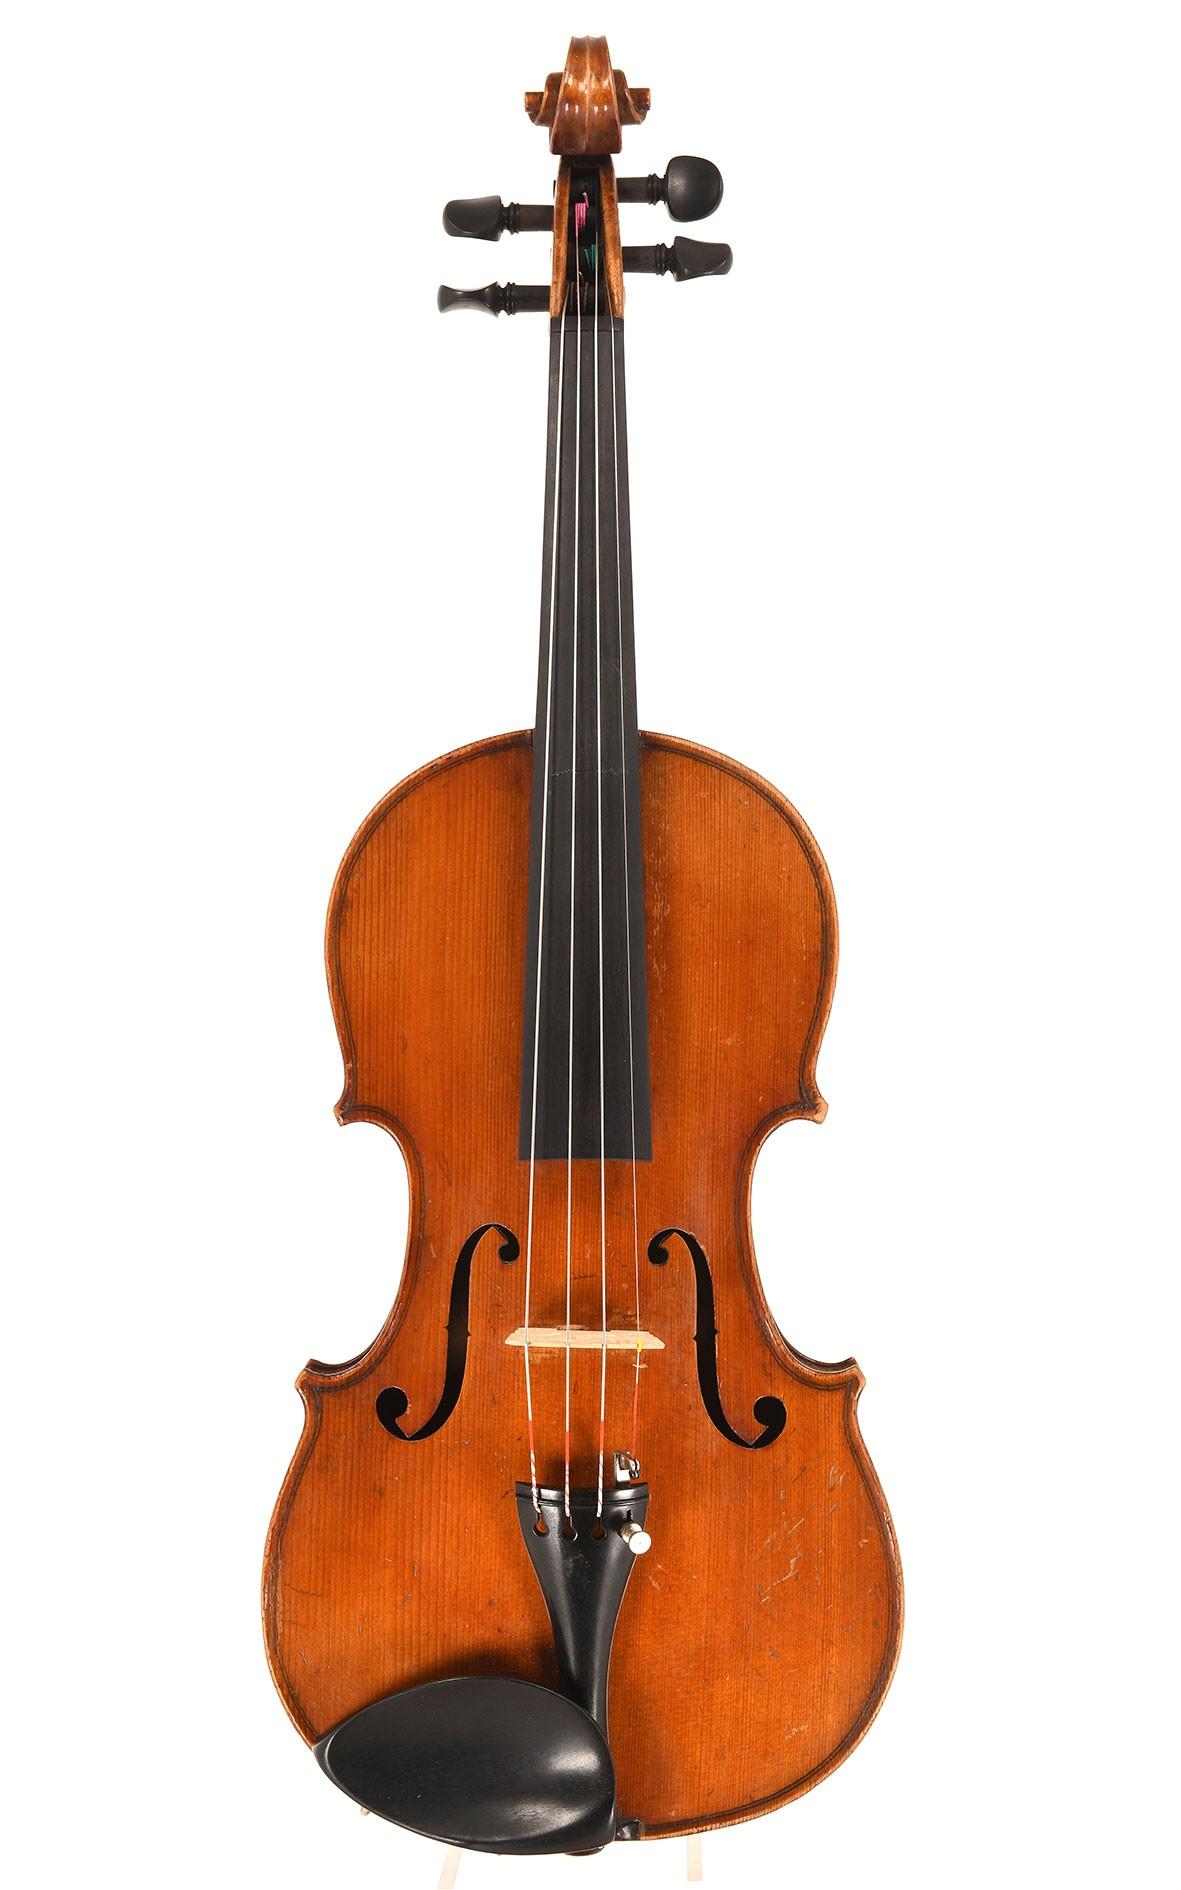 Antique French JTL violin